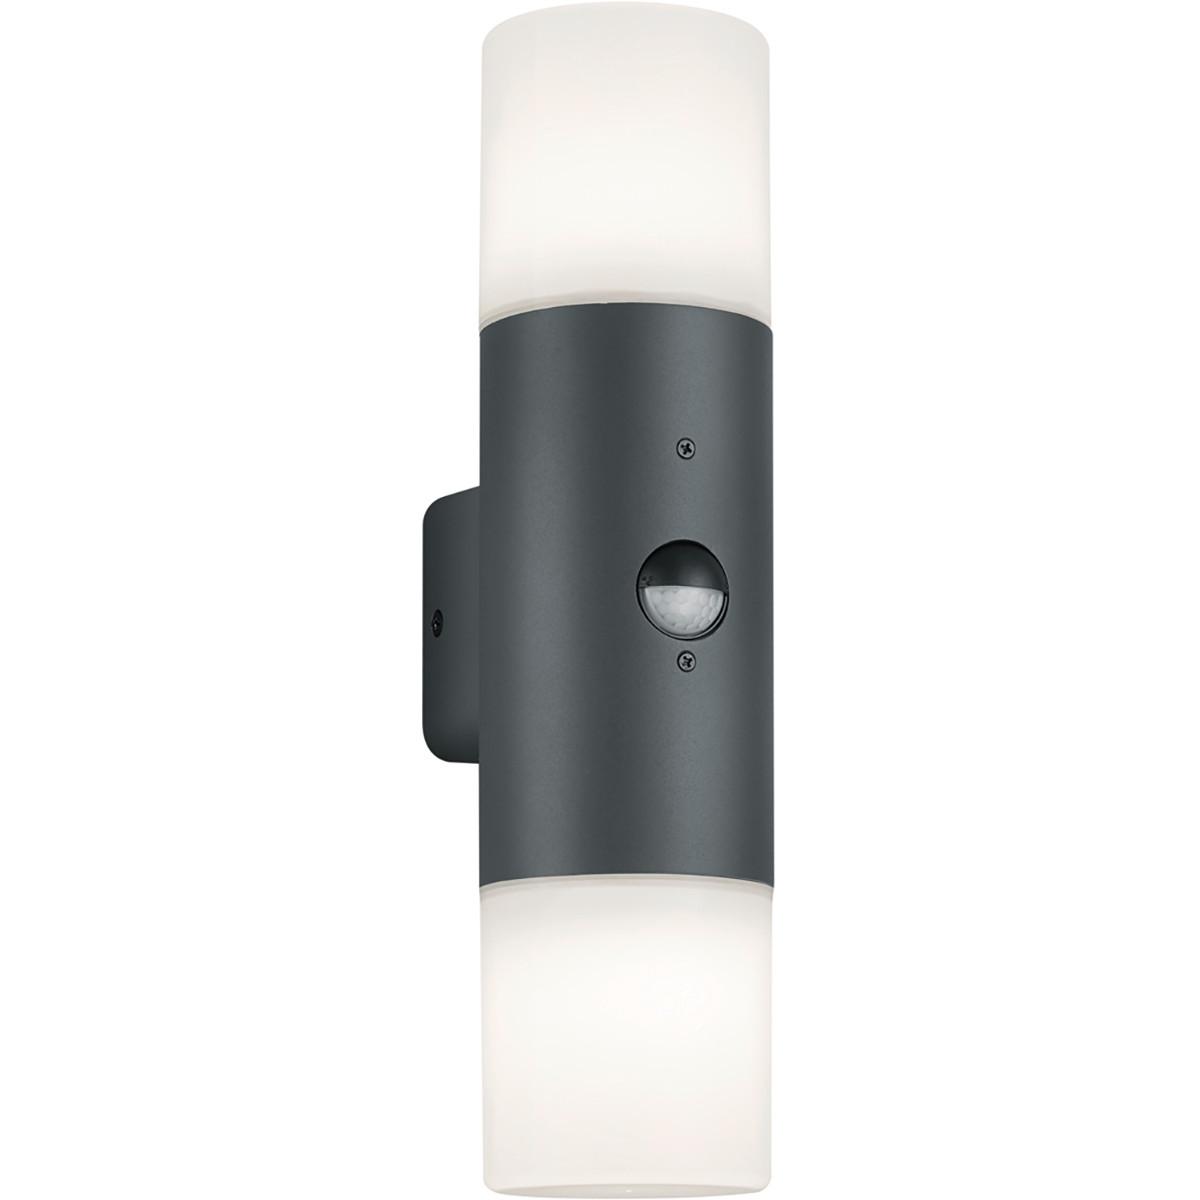 LED Tuinverlichting - Wandlamp - Trion Hosina - Bewegingssensor - E27 Fitting - 2-lichts - Mat Zwart